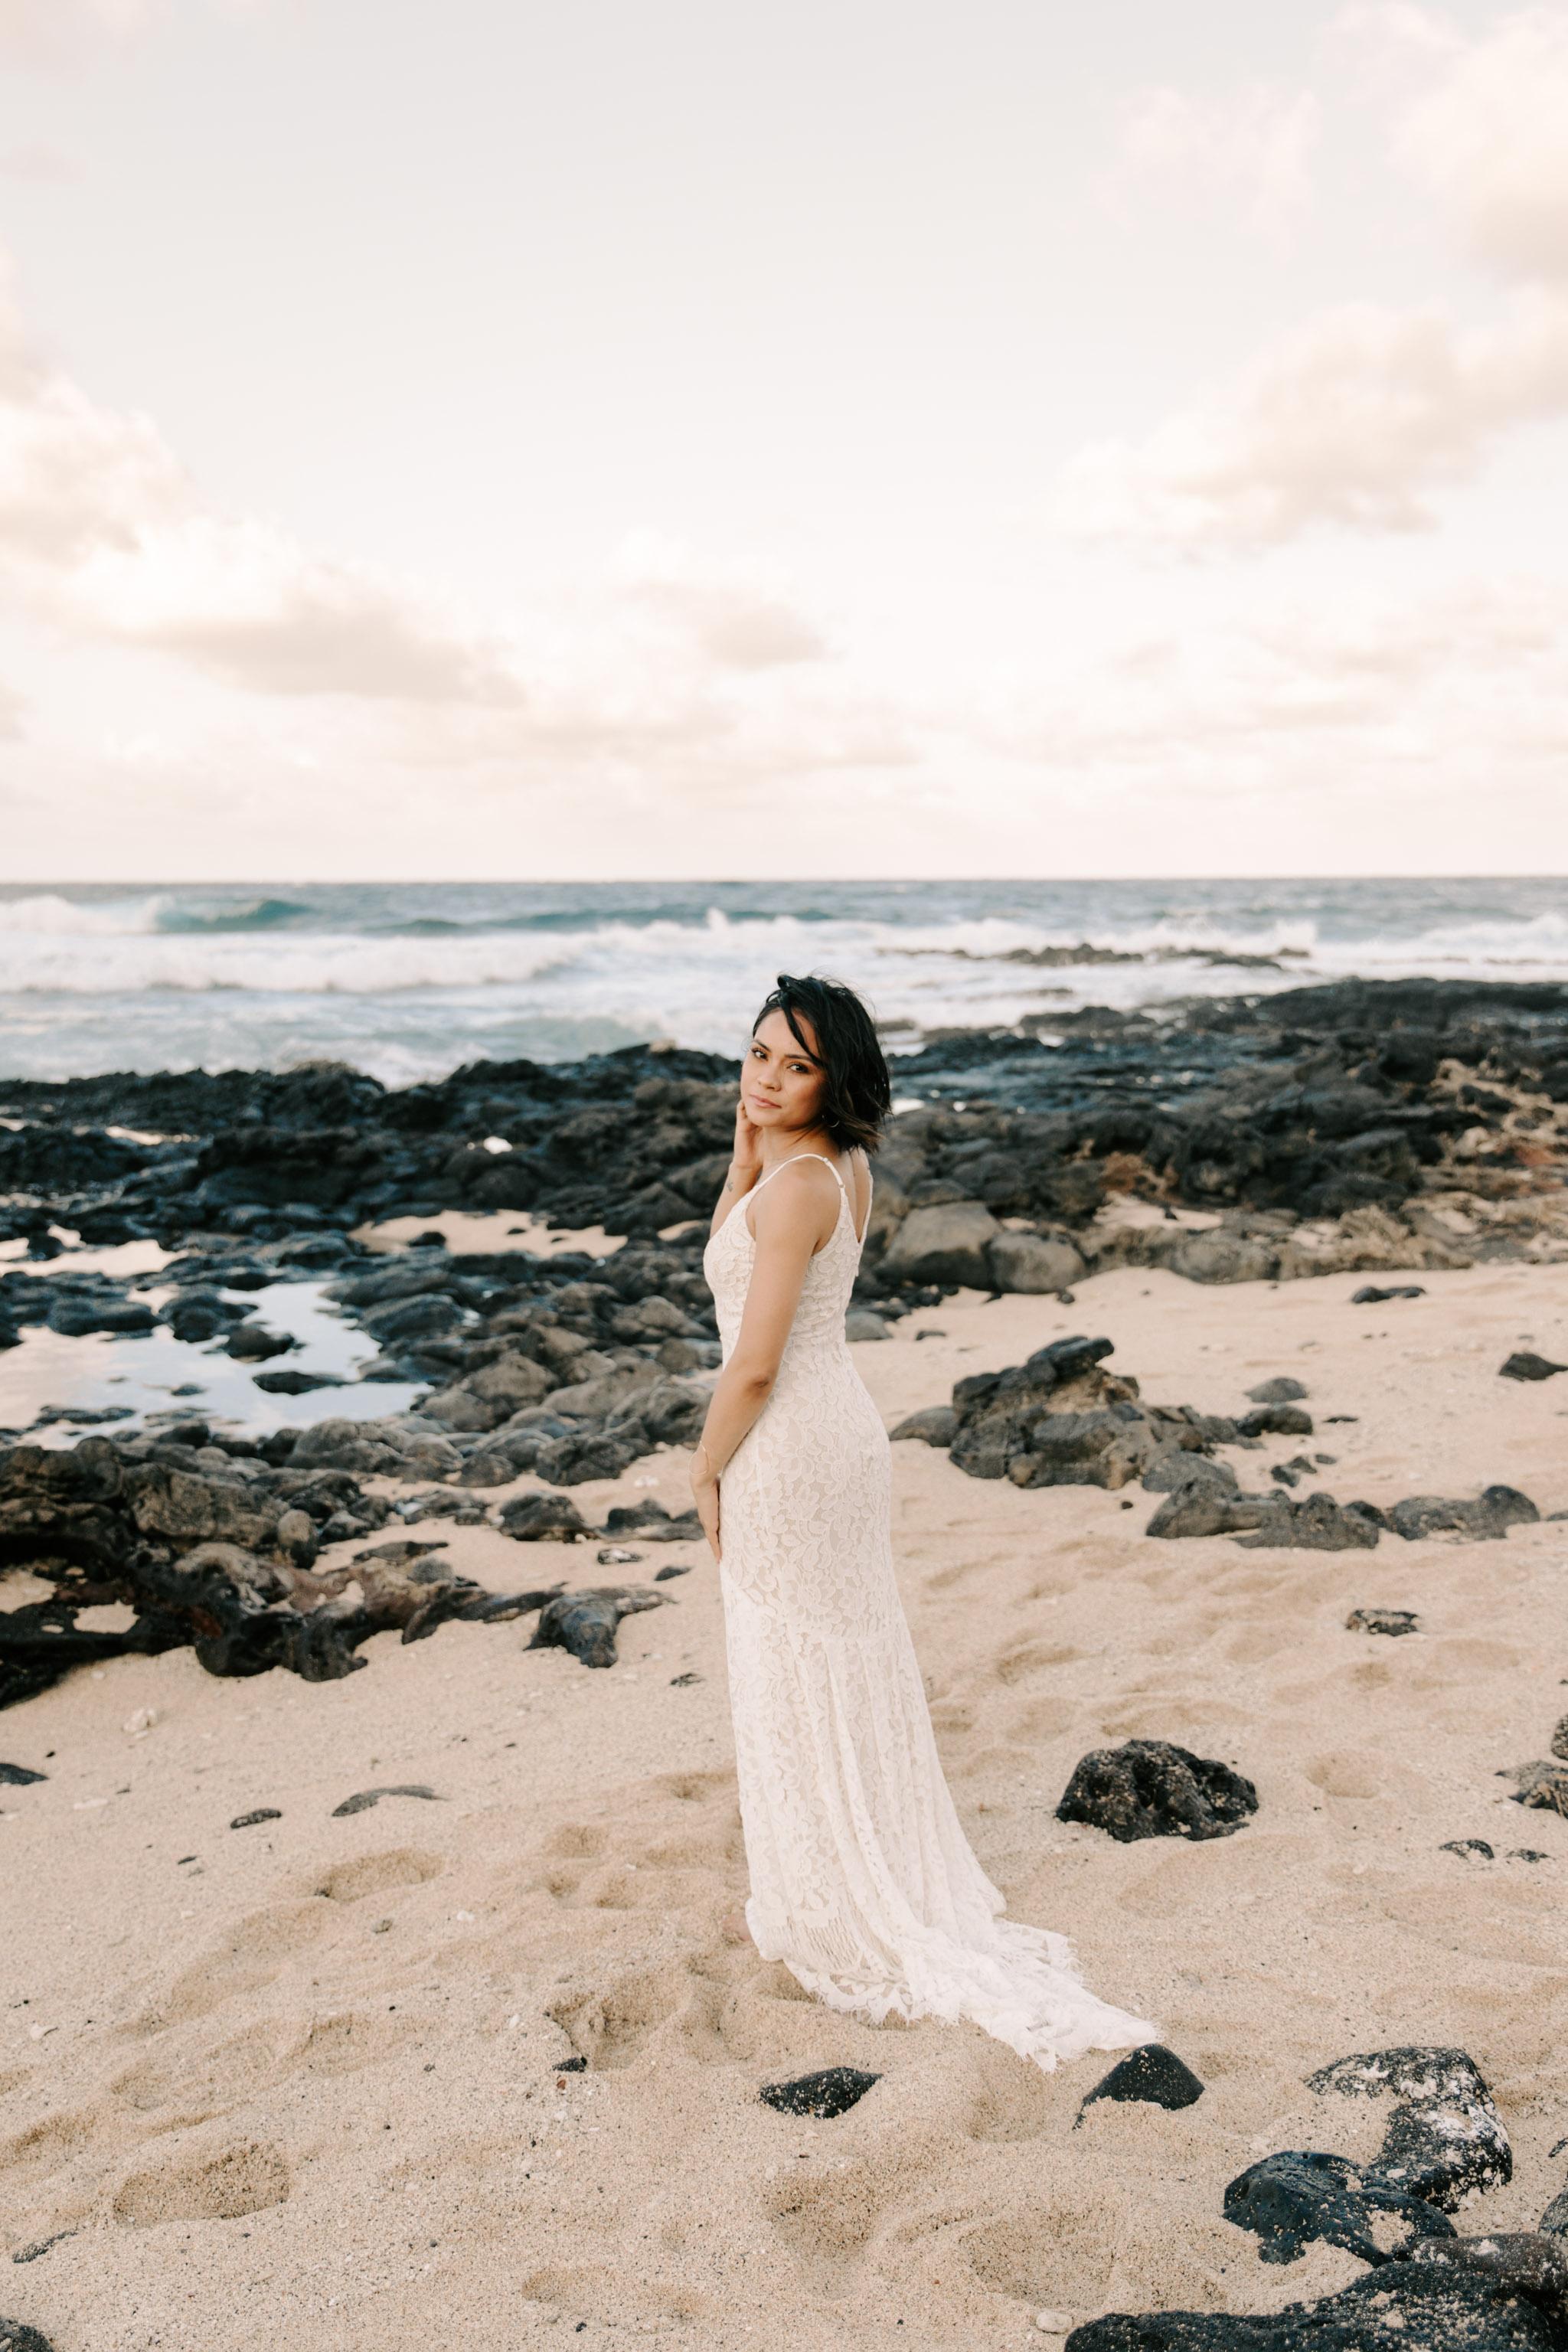 makapuu bridal portraits by oahu wedding photographer Desiree Leilani